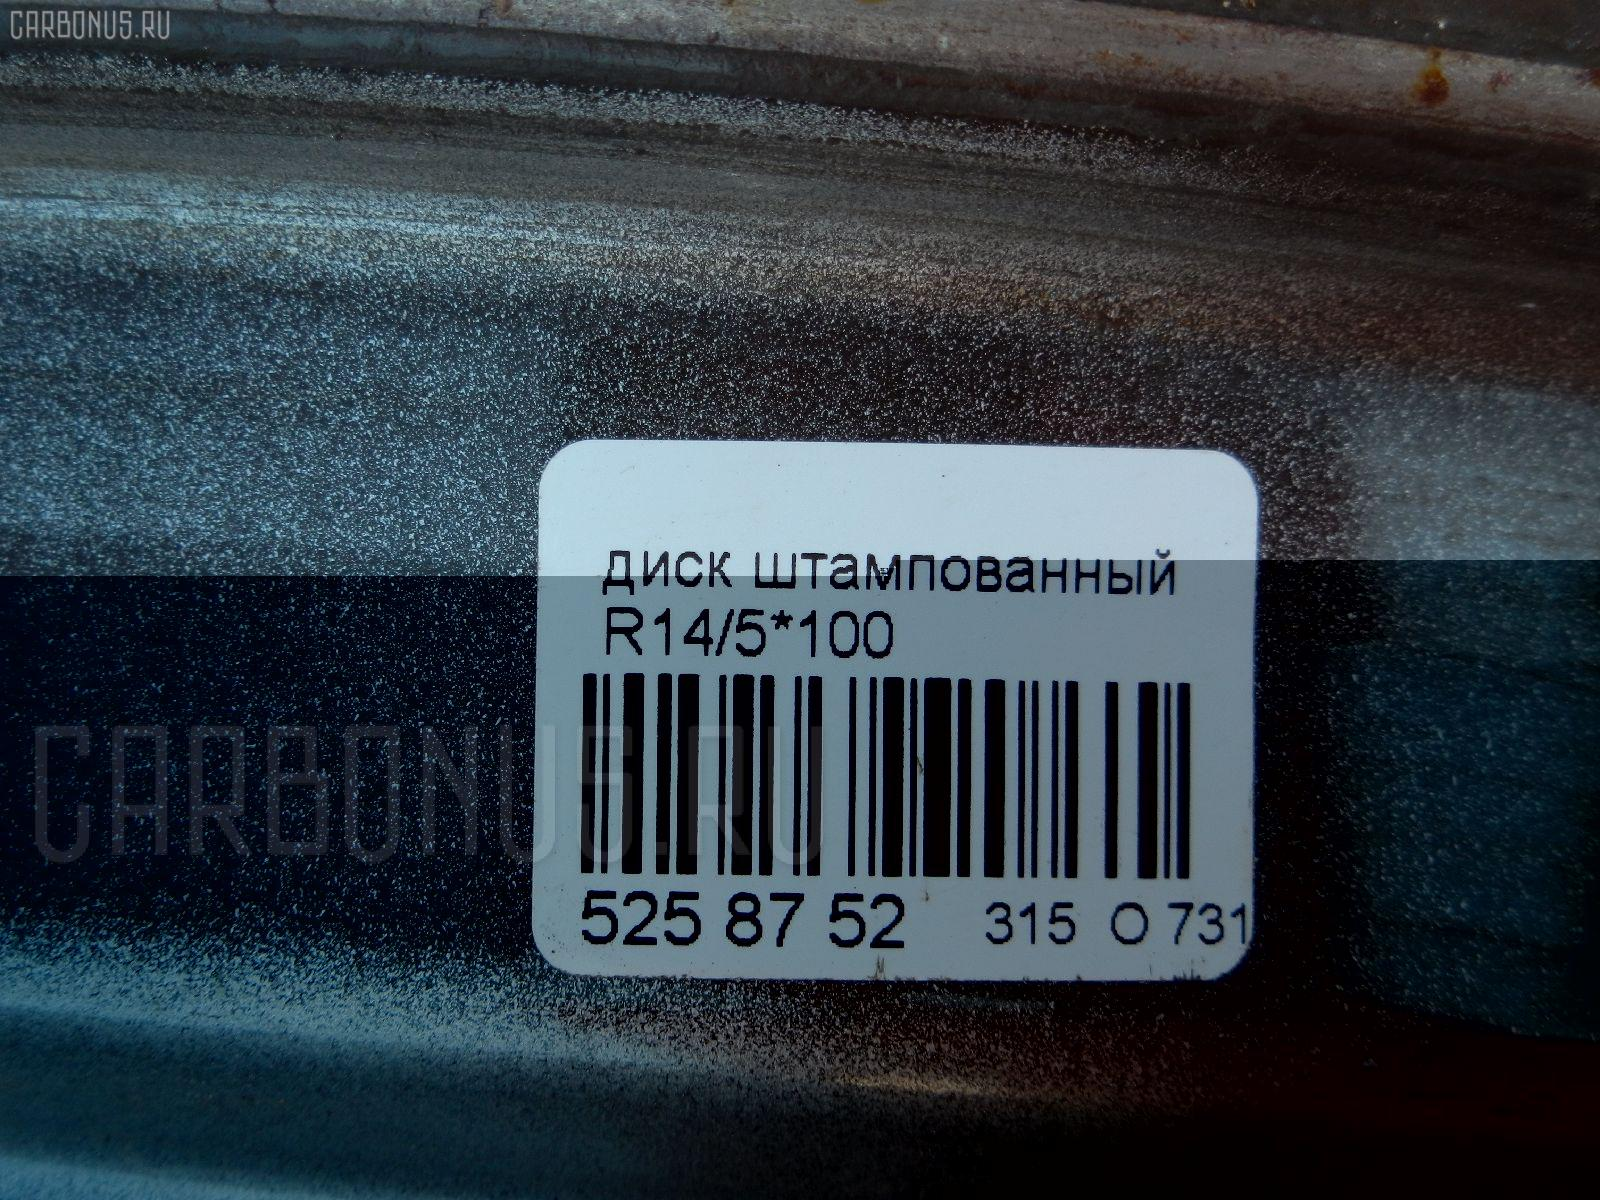 Диск штампованный R14 / 5-100 Фото 2